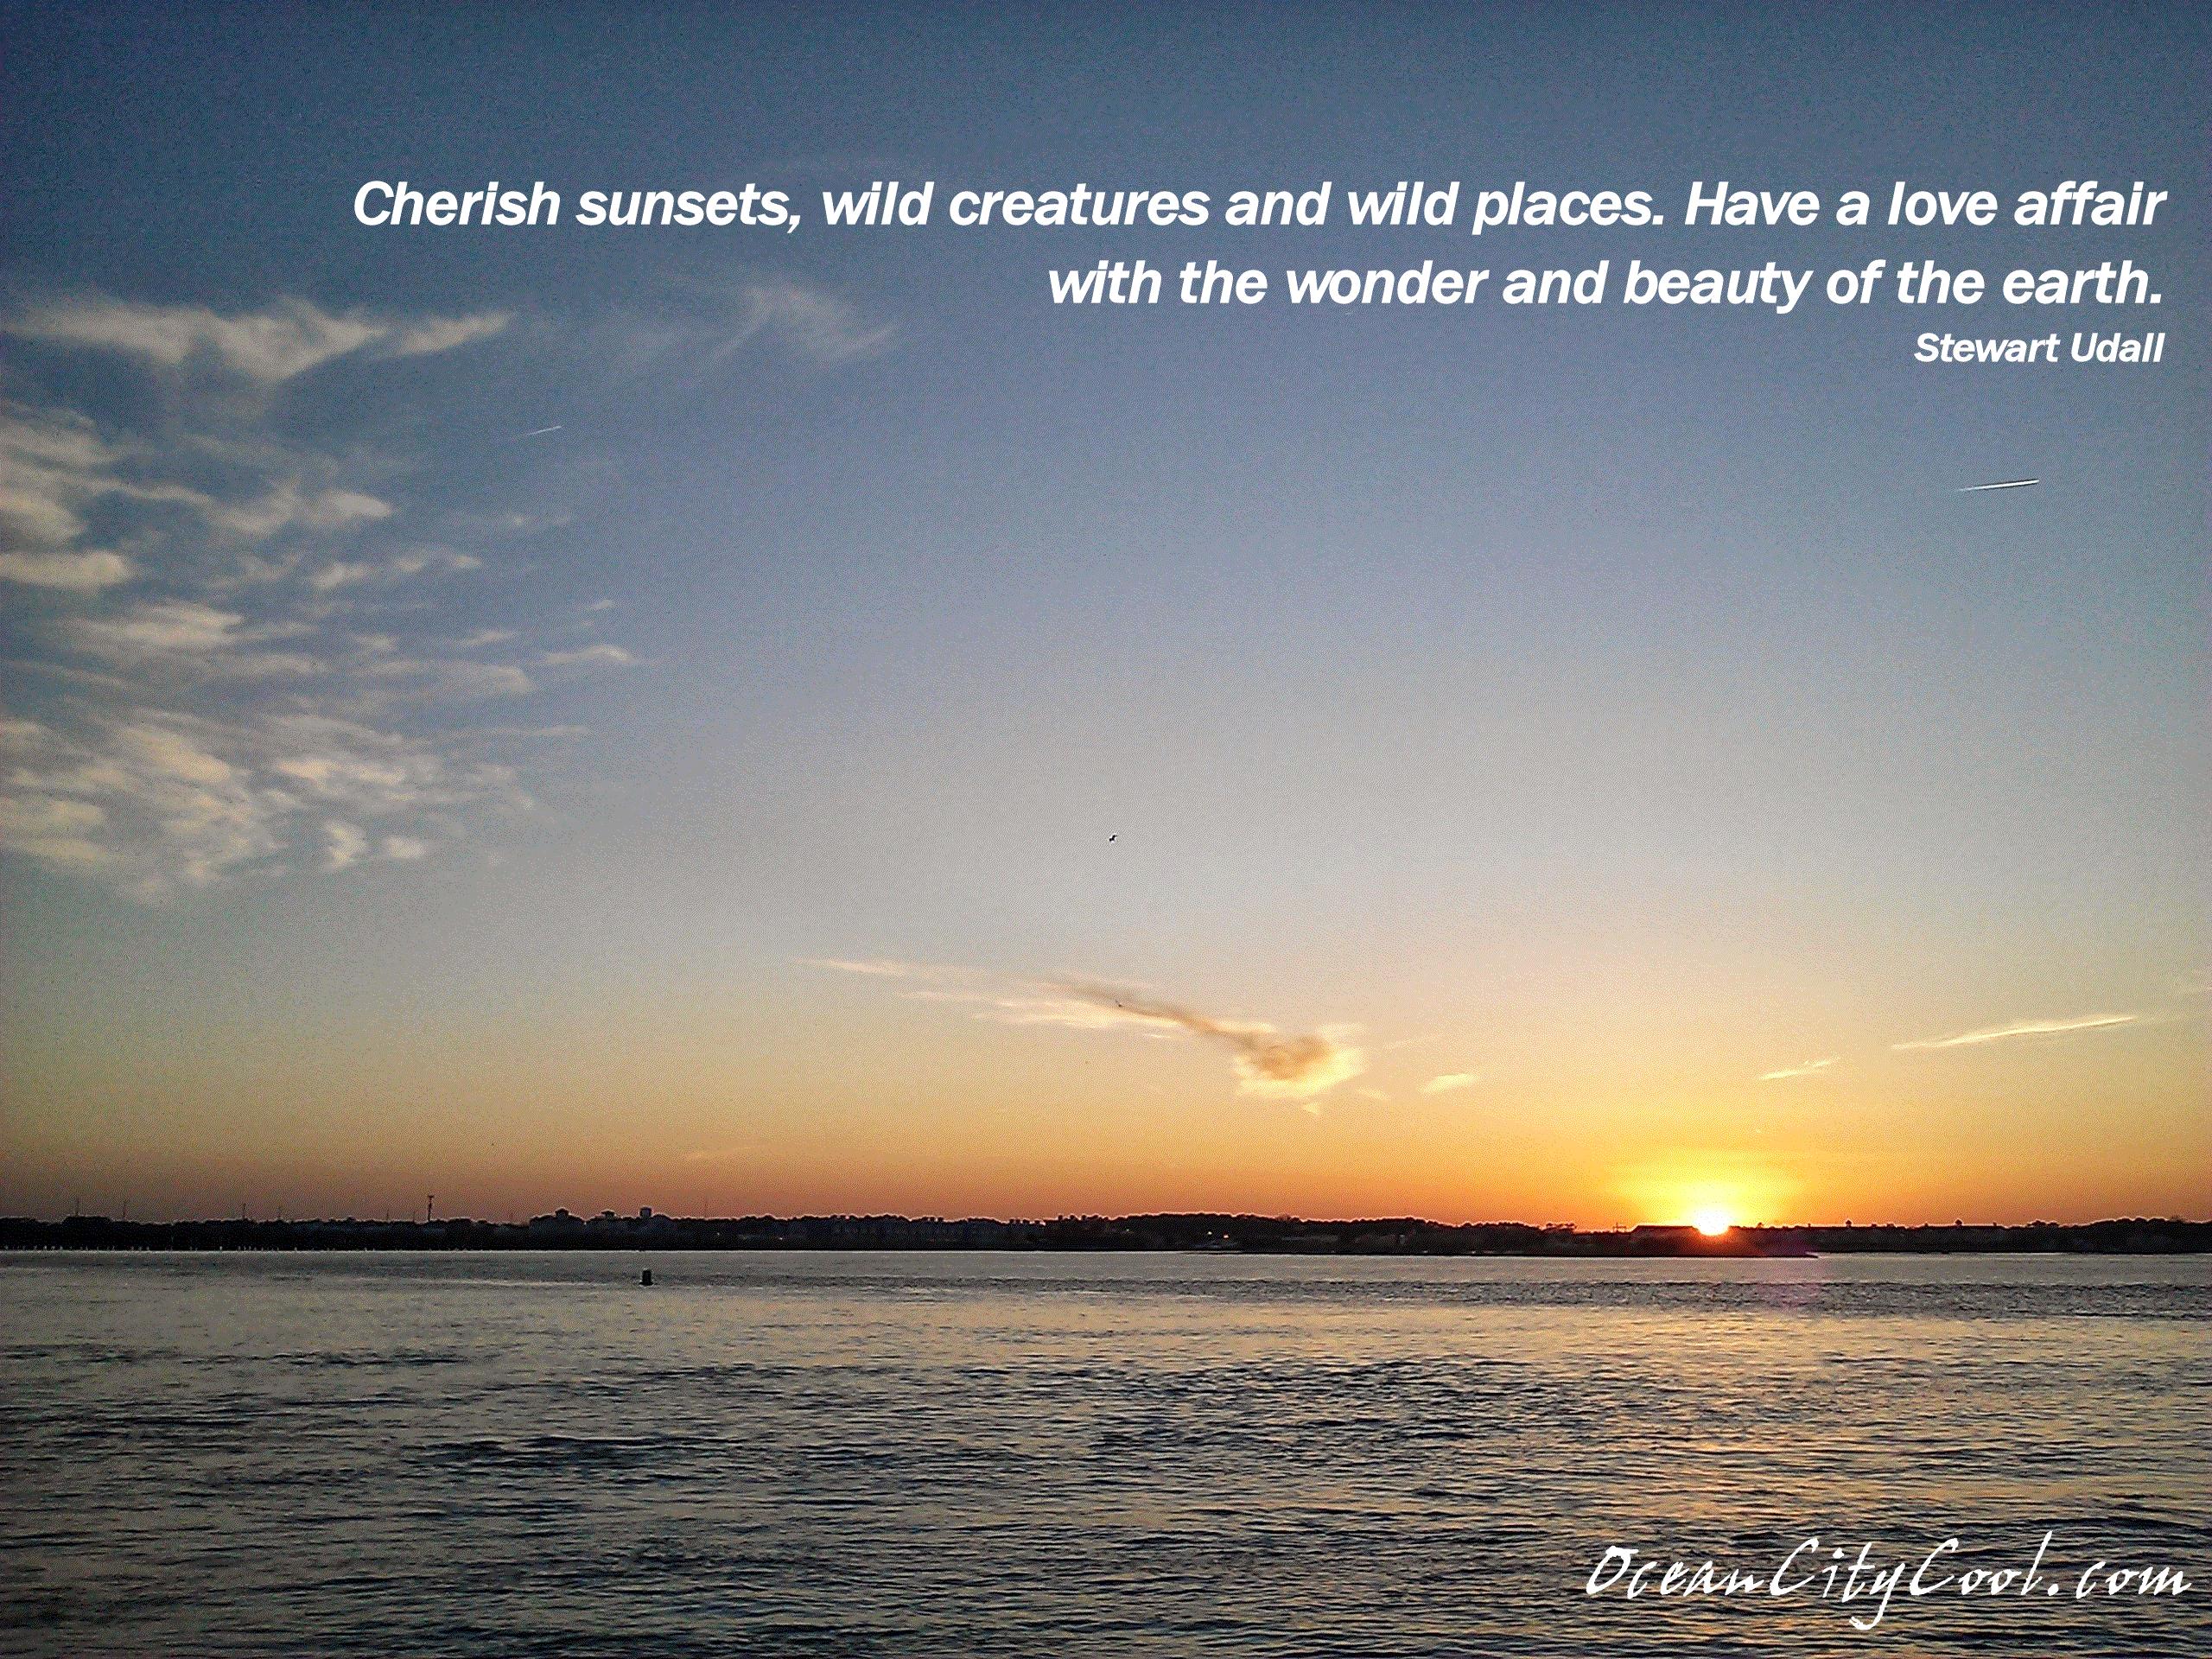 Sailing Quotes Inspirational Quotesgram: Sunset Quotes Inspirational. QuotesGram